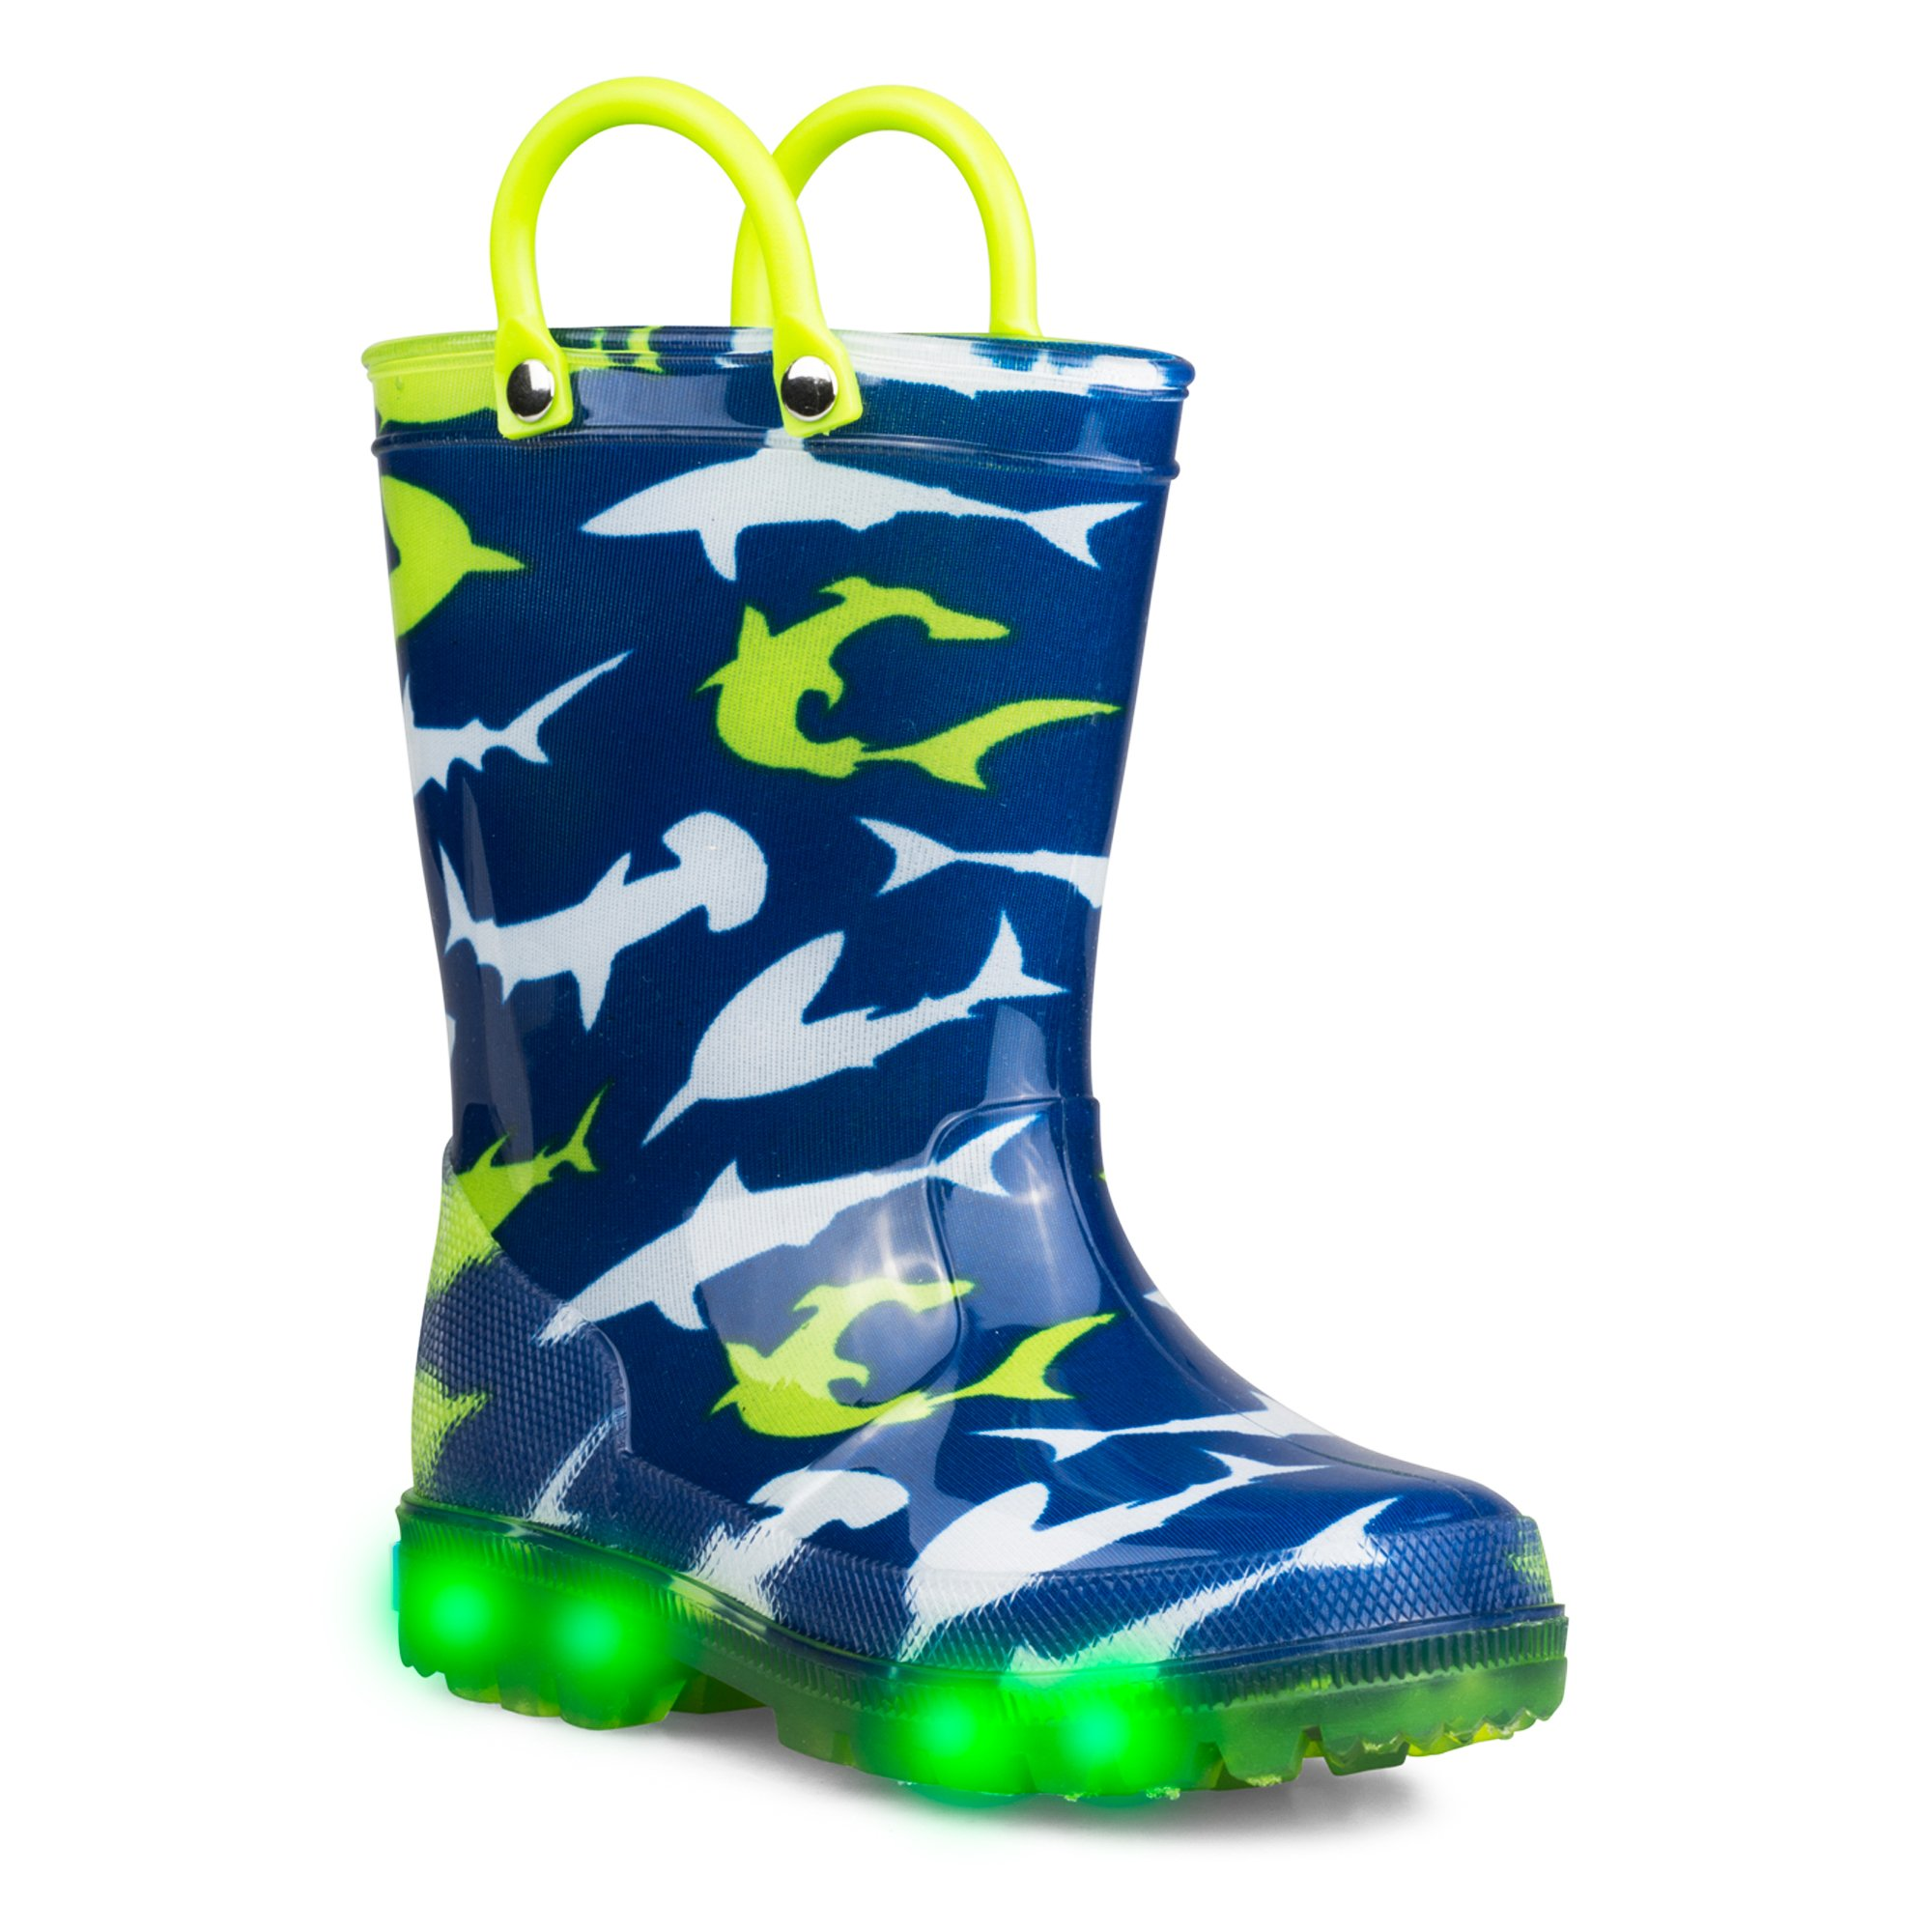 ZOOGS Kids Light-up Rainboots, Waterproof, Pull Handles, Fun Colors